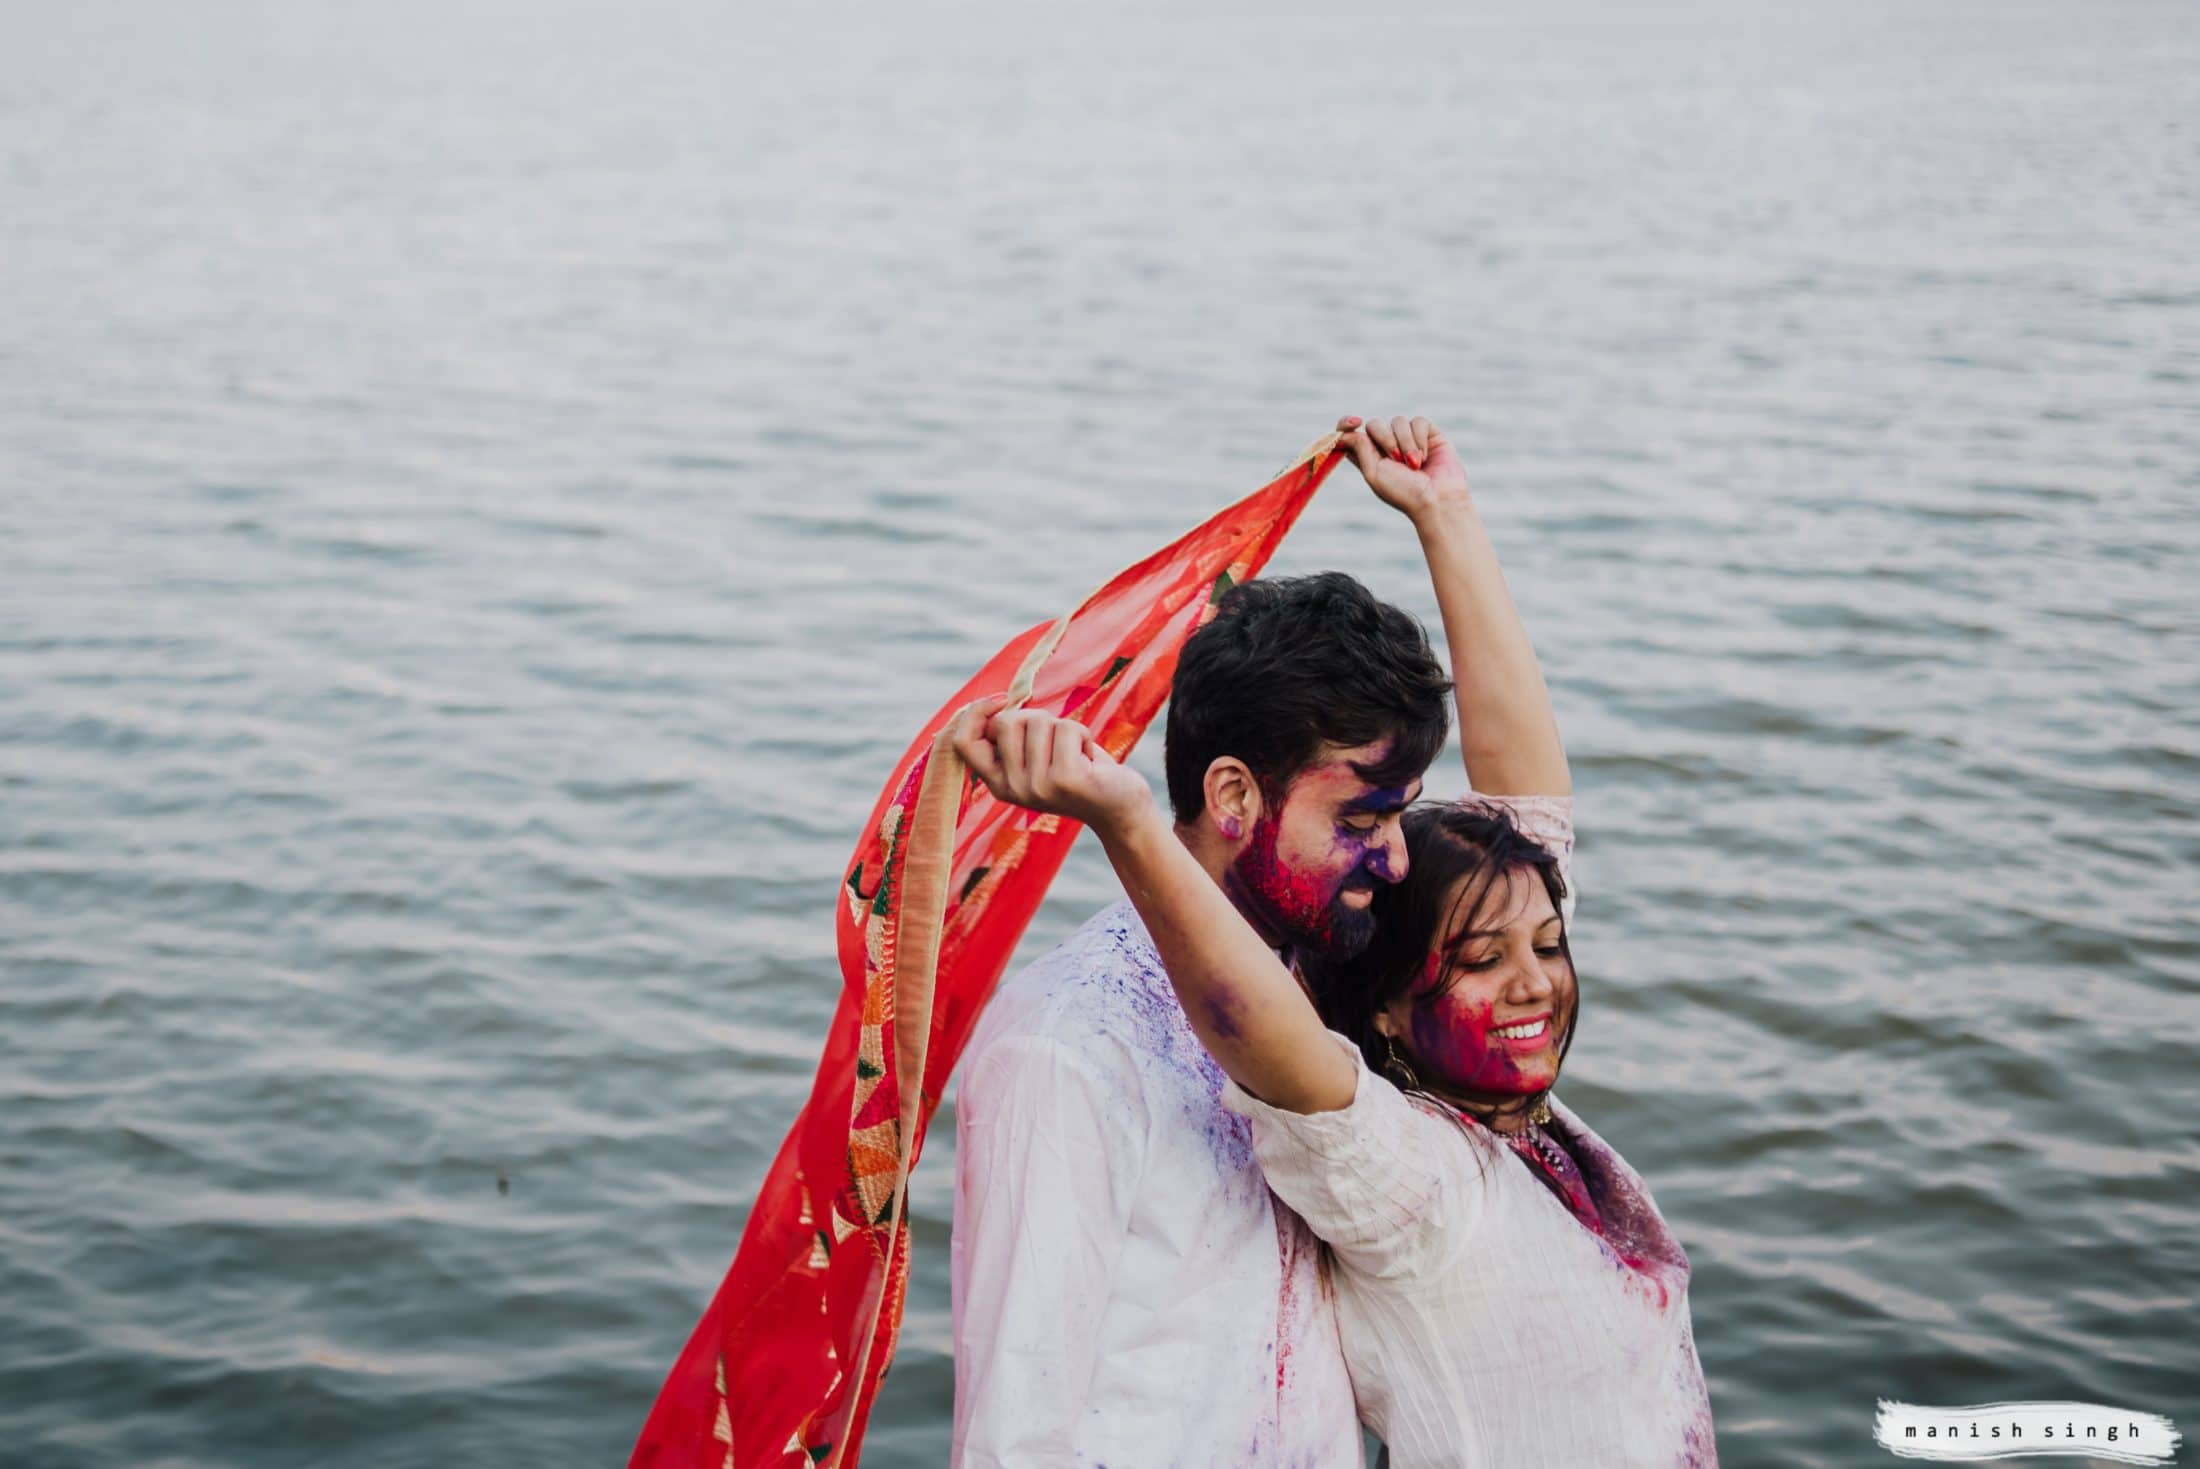 Pre wedding Photoshoot with holi colors Bangalore lake